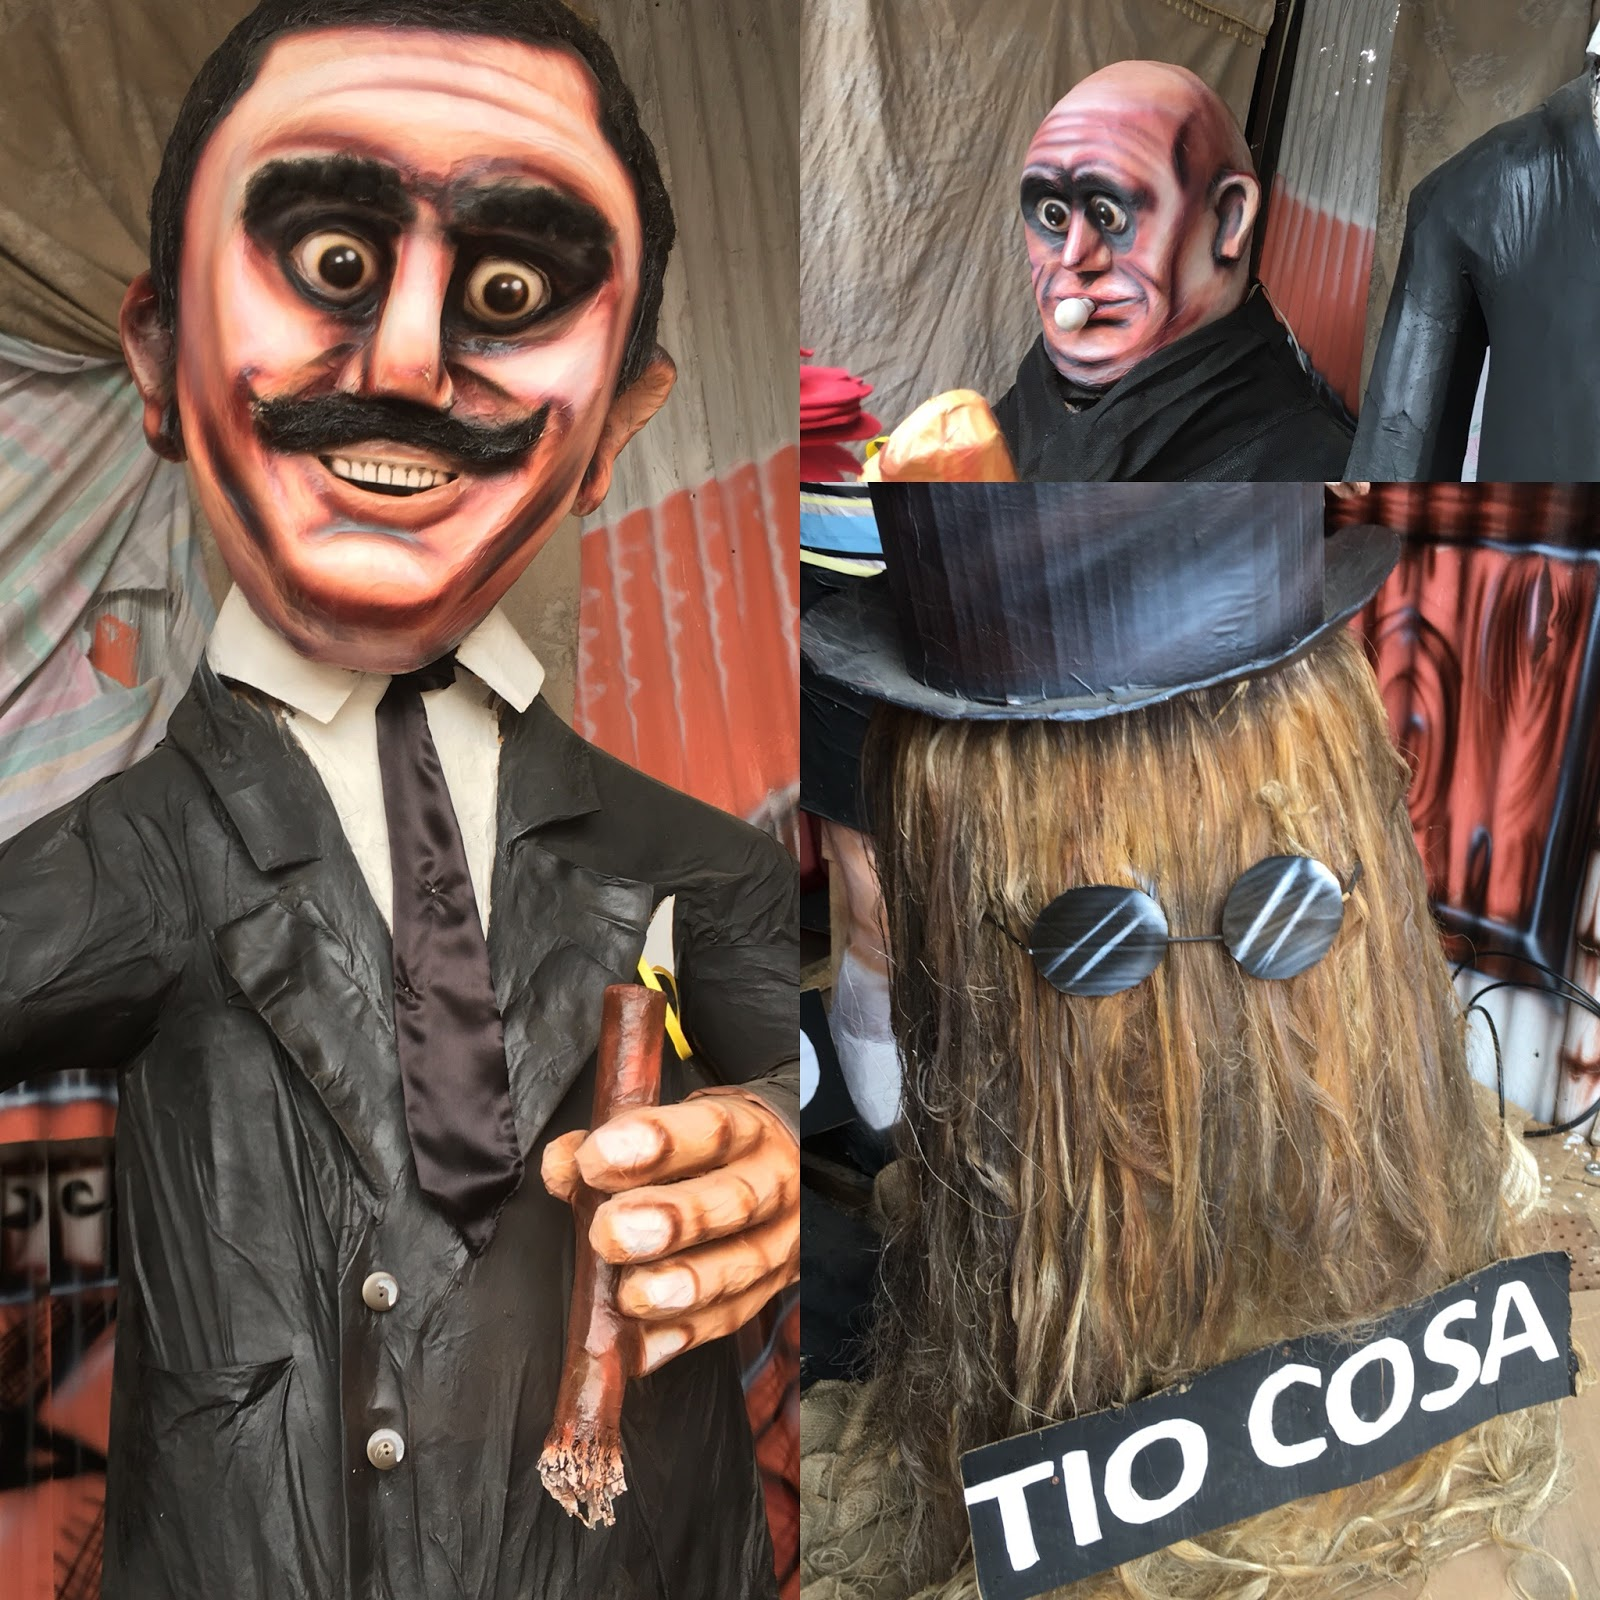 Bitácora: Guayaquil y la Ruta de los Gigantes de Papel